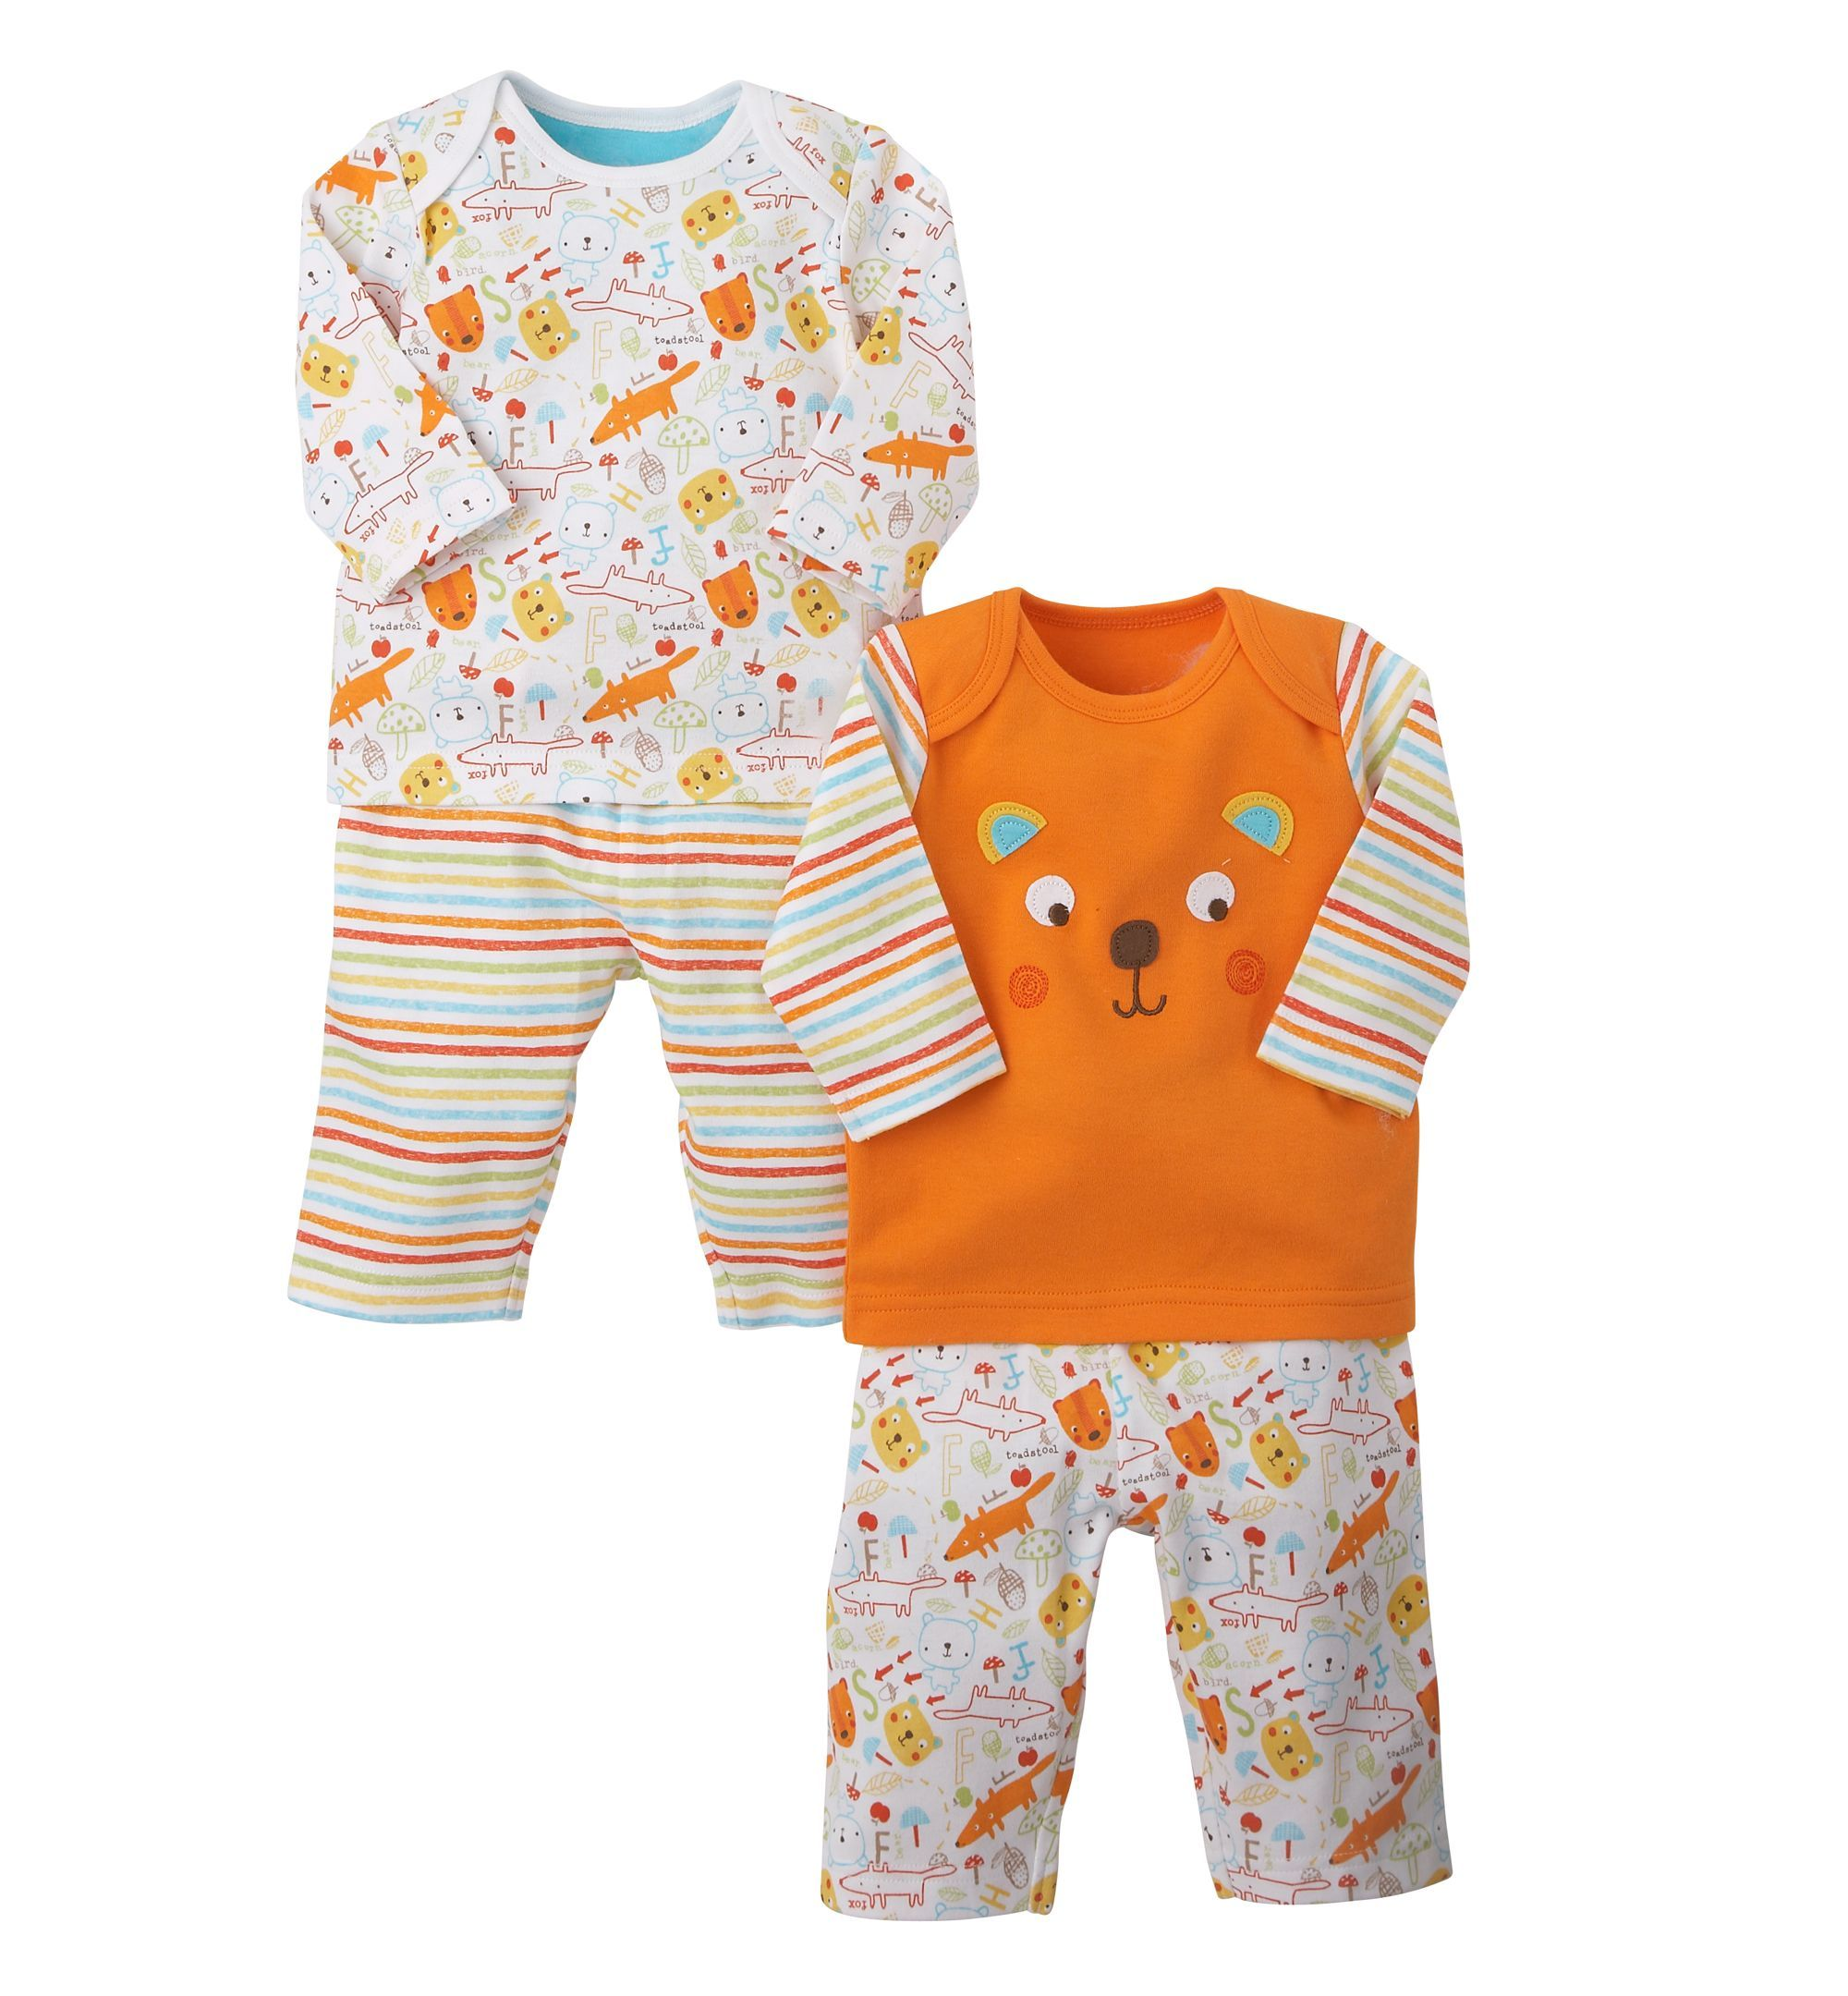 20e68cb1b95f3 Mothercare Woodland Critters Pyjamas- 2 Pack